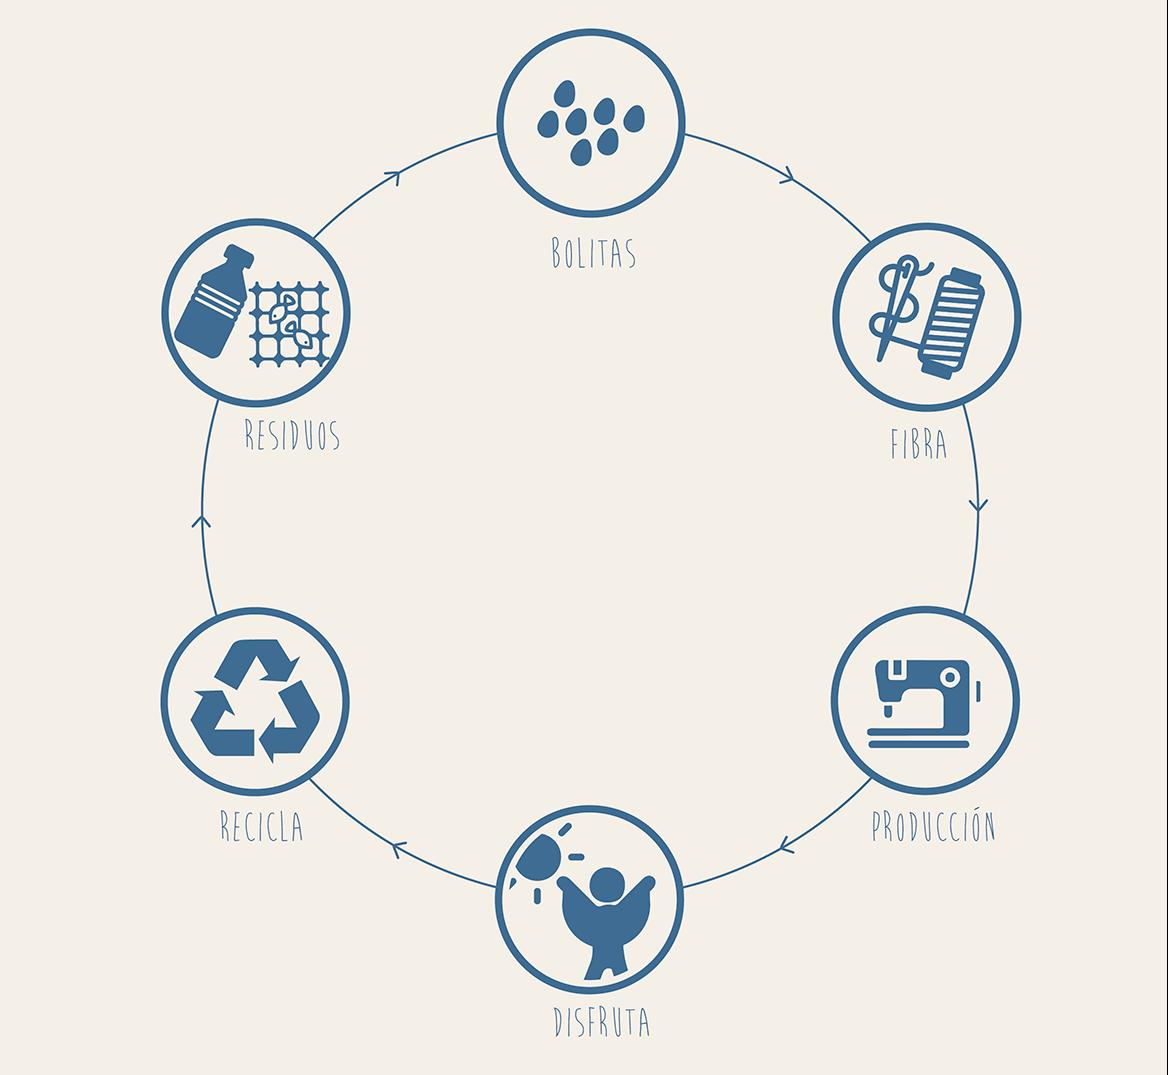 sostenibilidad-fromsunwithlove